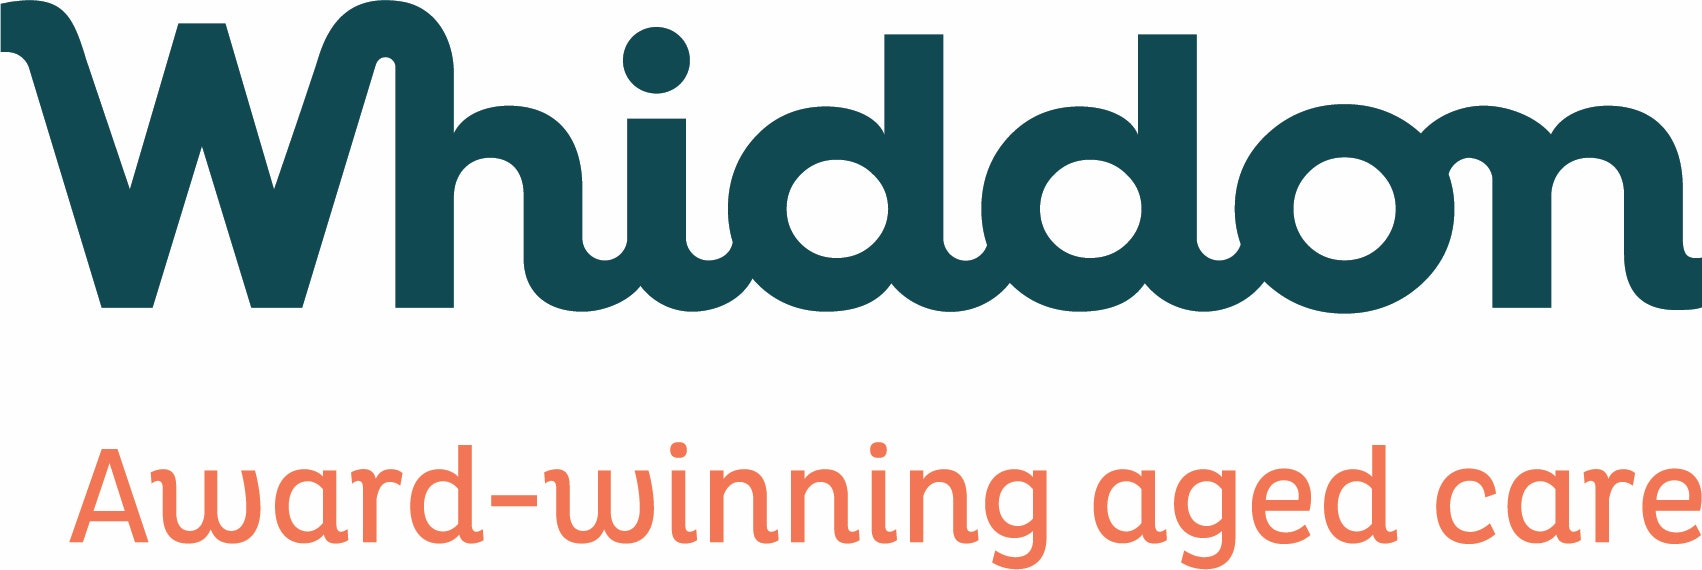 Whiddon Hamilton Retirement Village logo